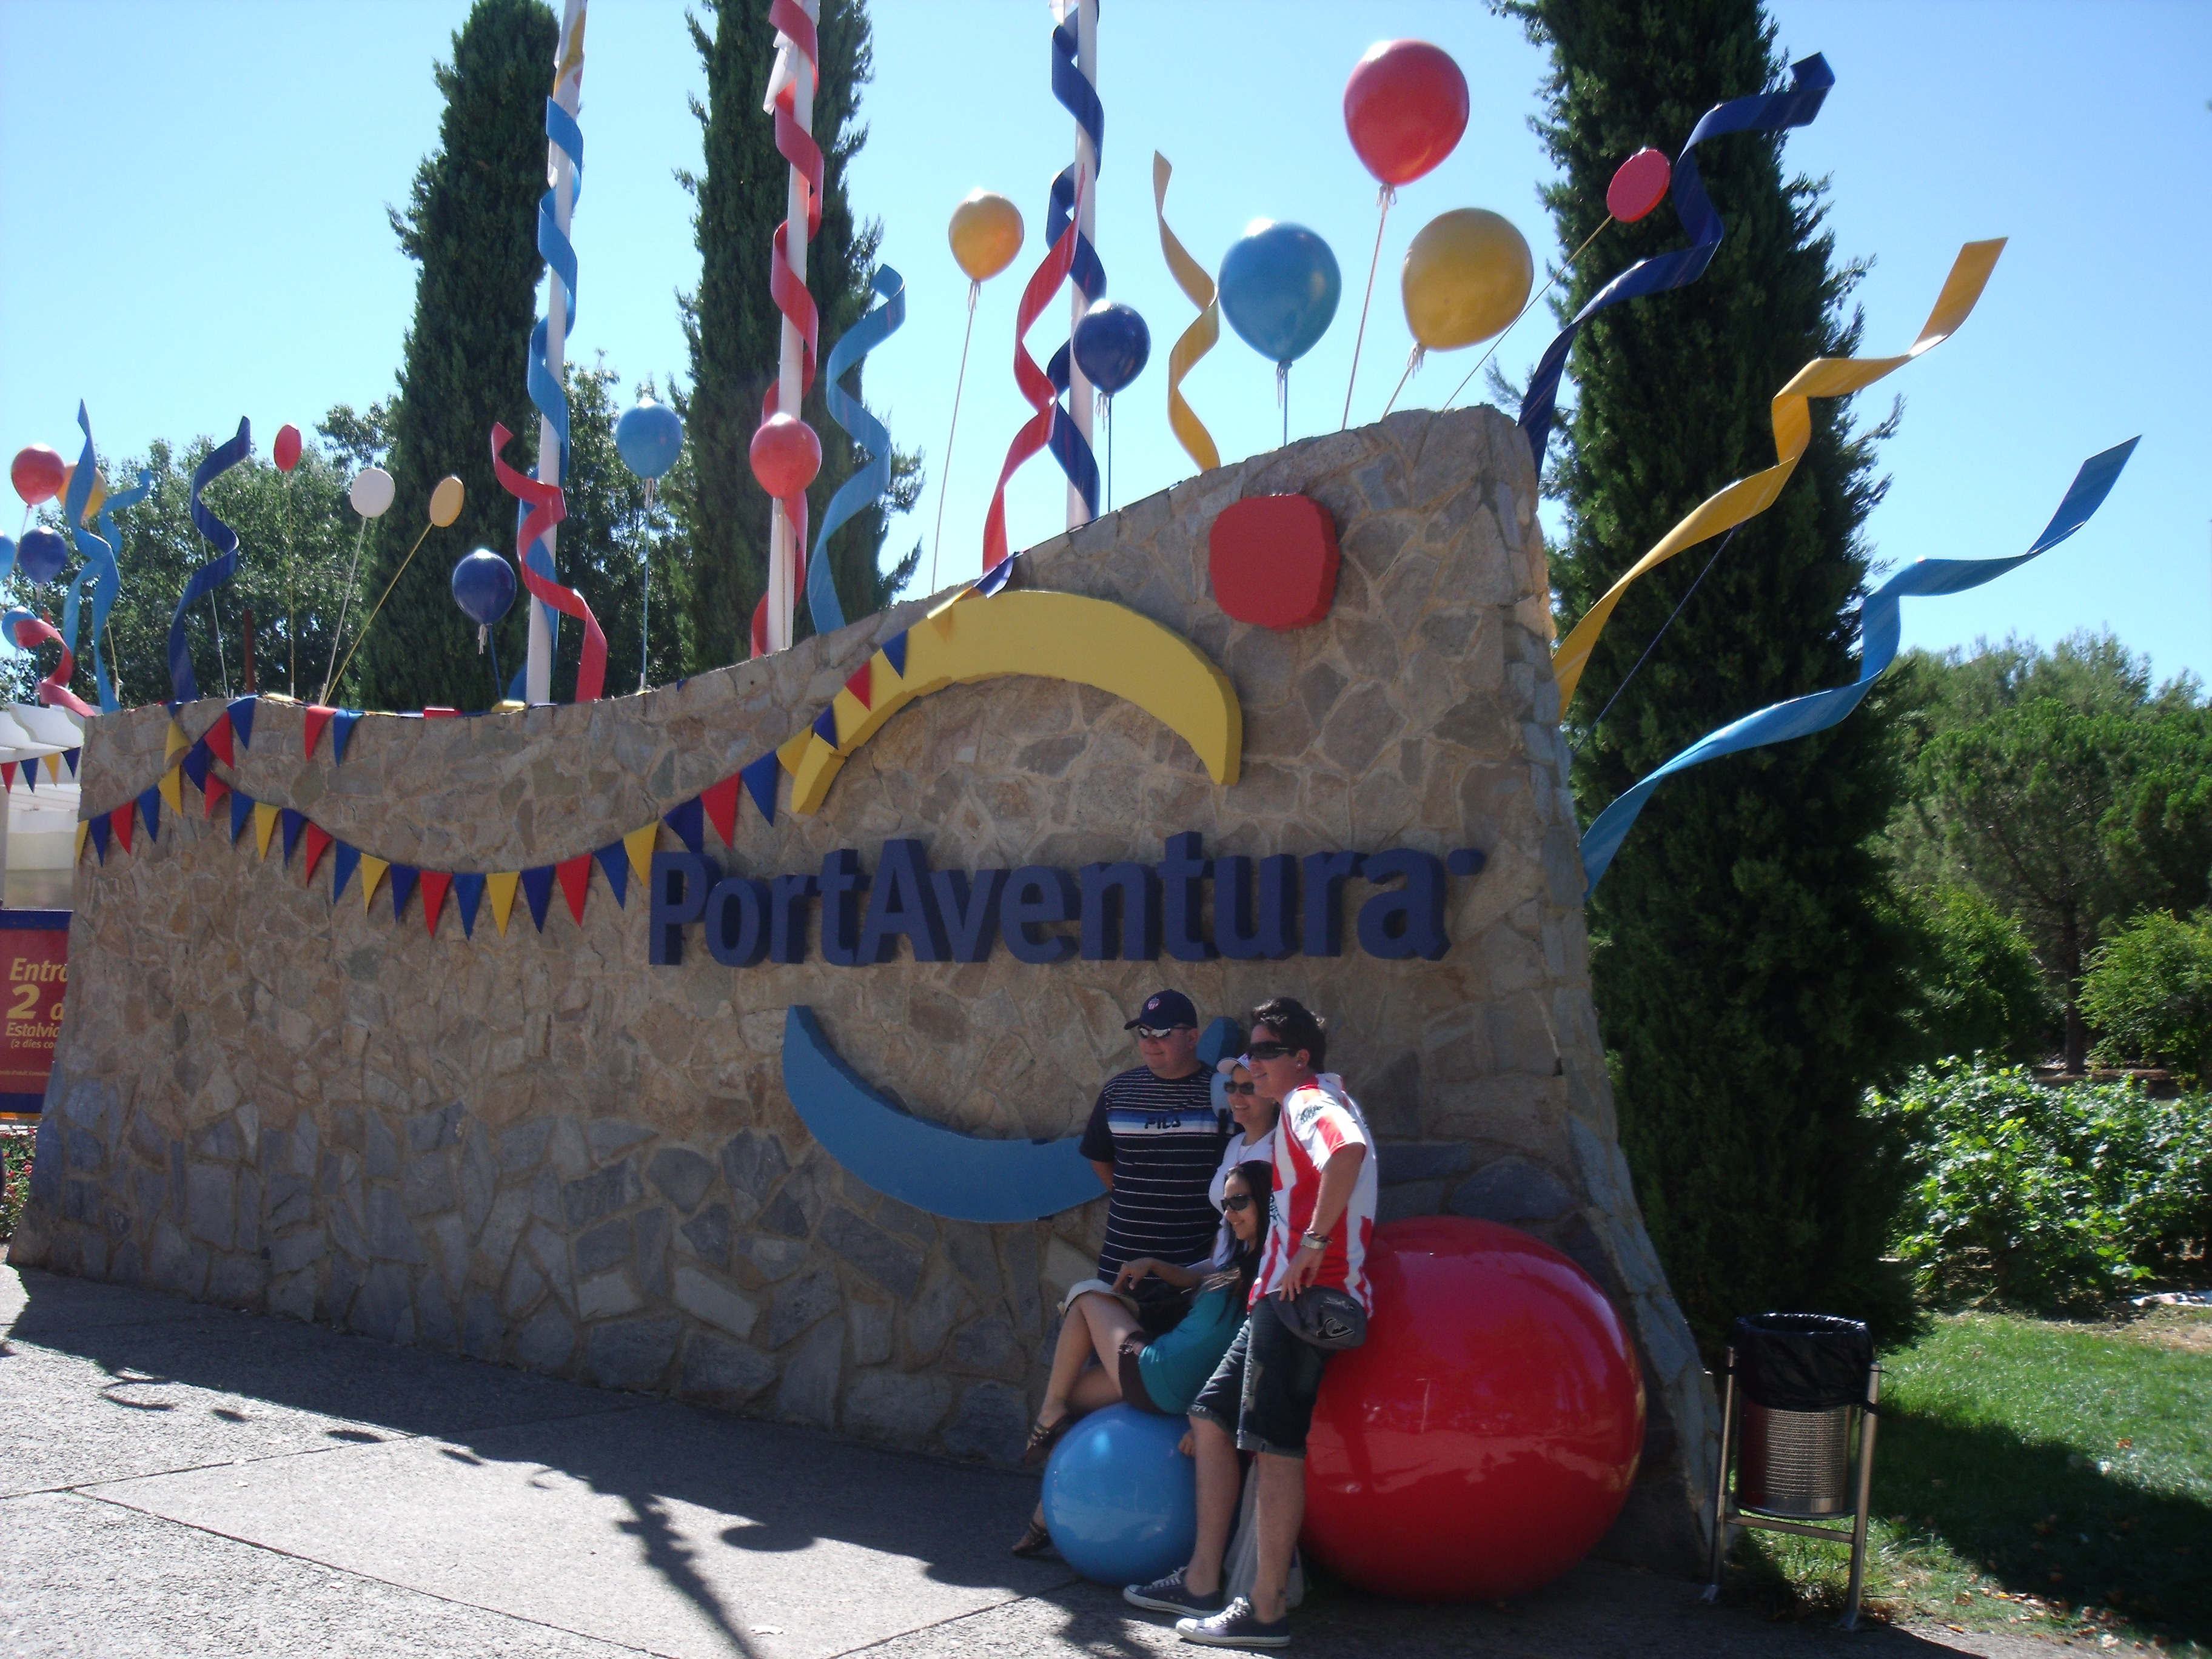 FilePortAventura Entrada JPG Wikimedia Commons - Entree port aventura